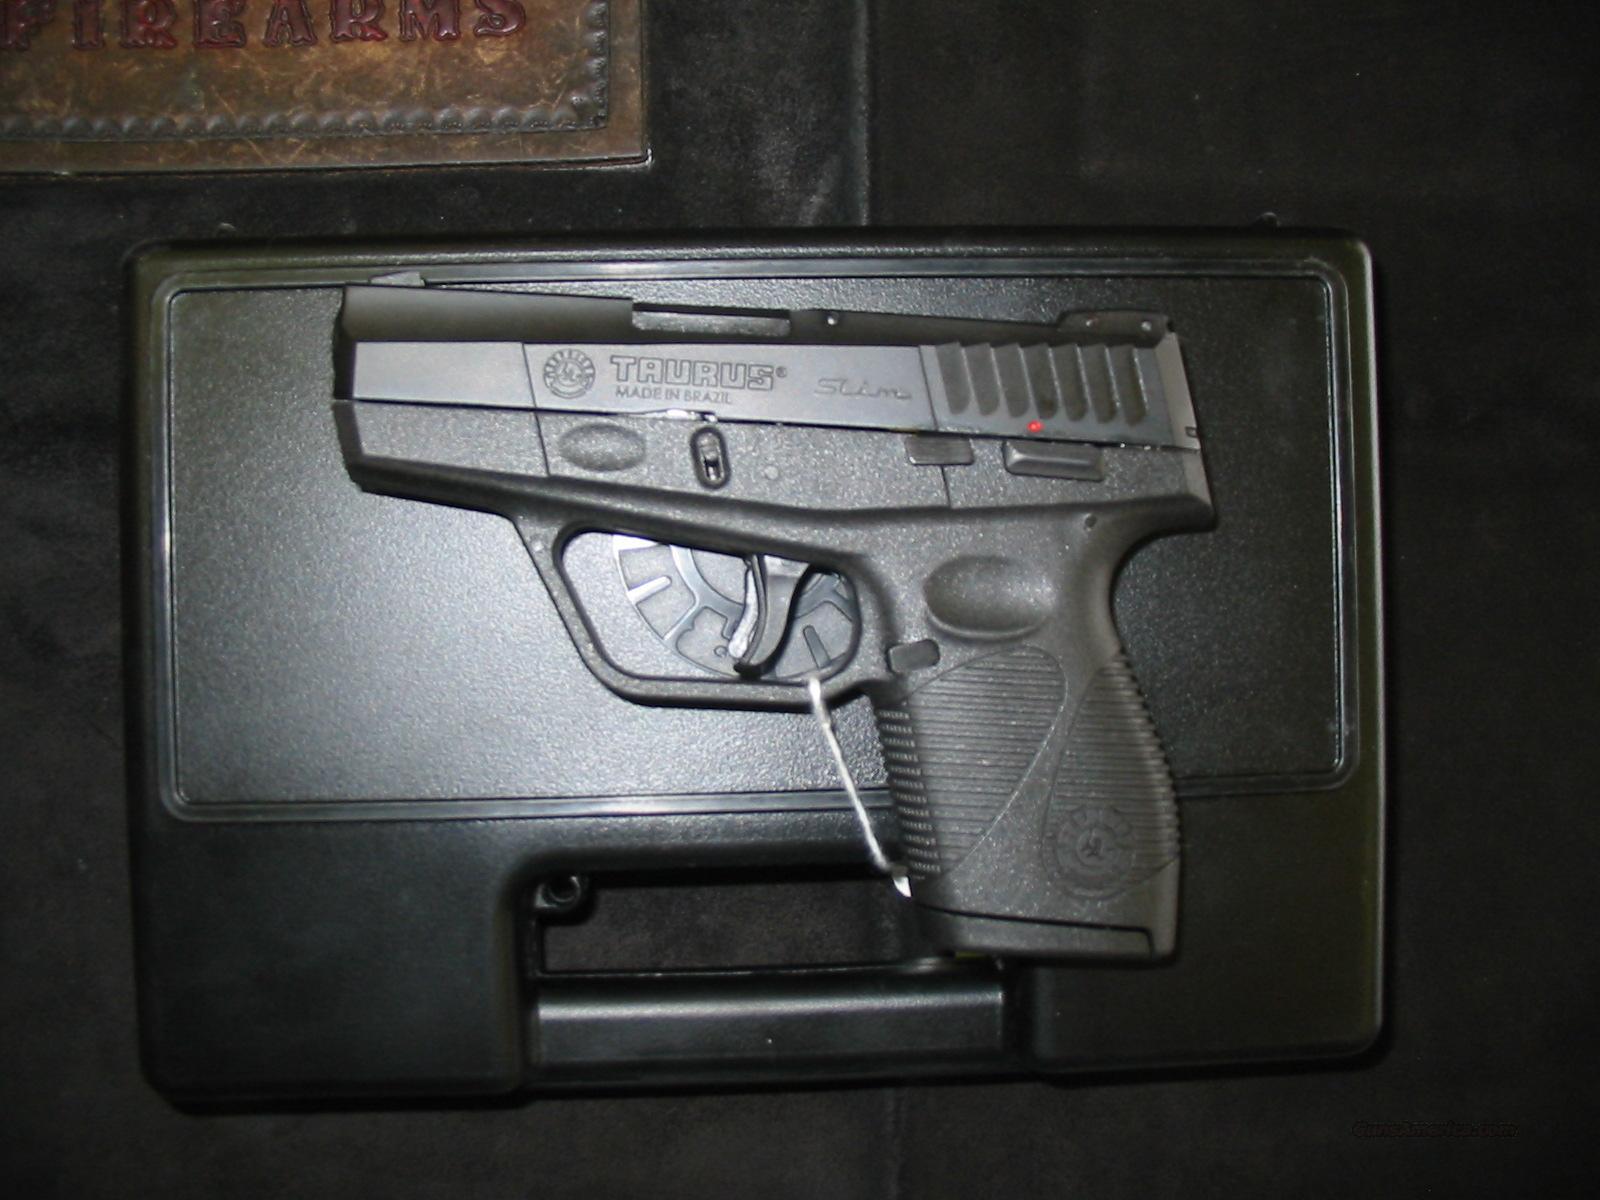 709 slim 9mm pistol - Taurus 709 Slim 9mm Guns Pistols Taurus Pistols Revolvers Pistols